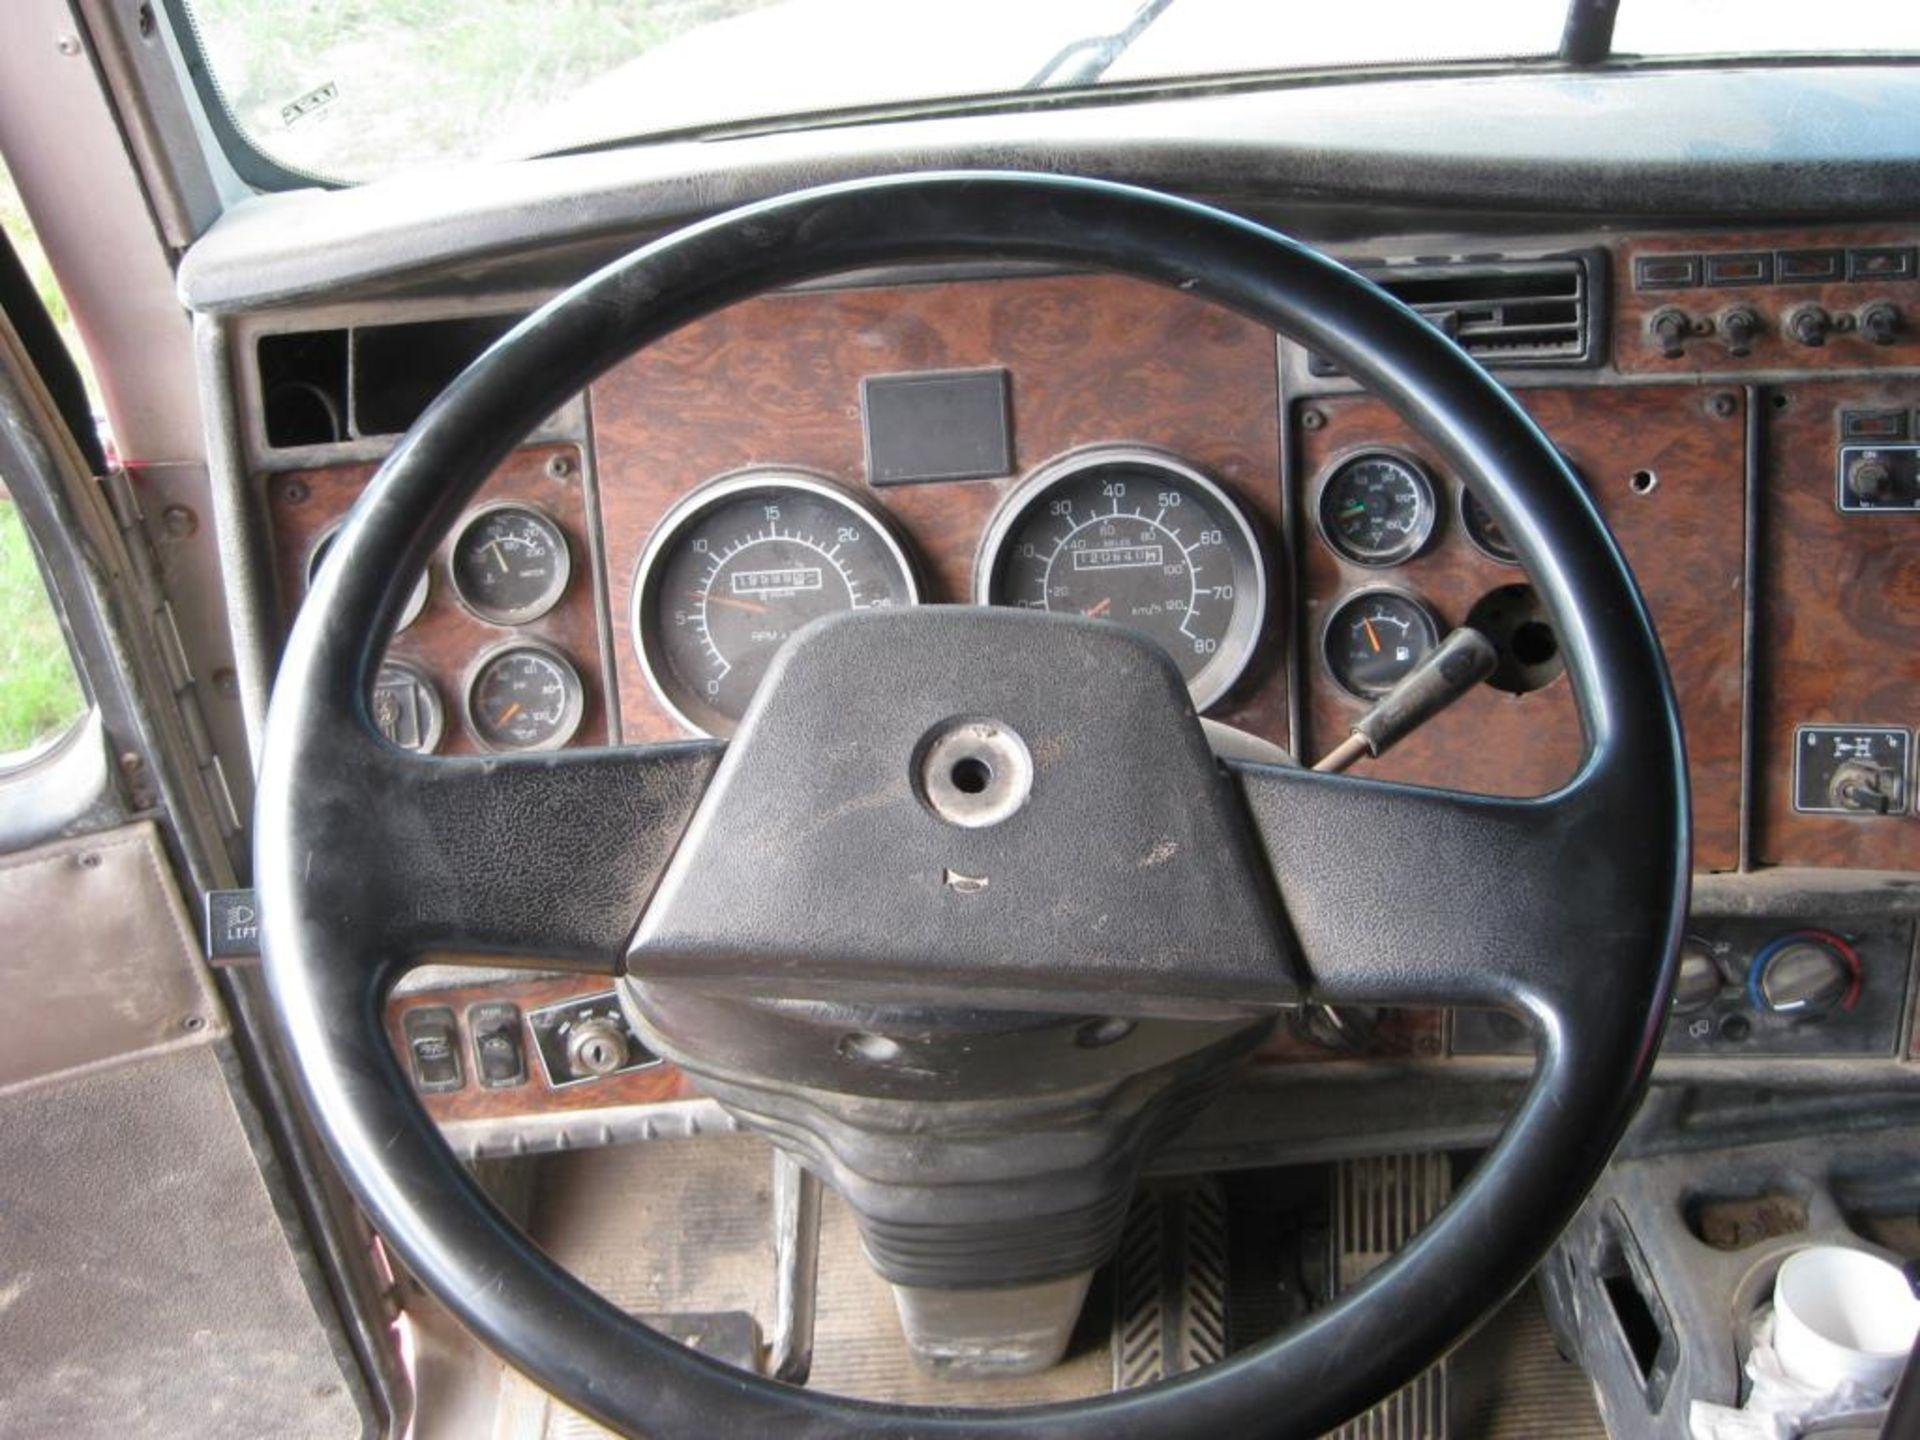 Kenworth Truck - Image 14 of 21